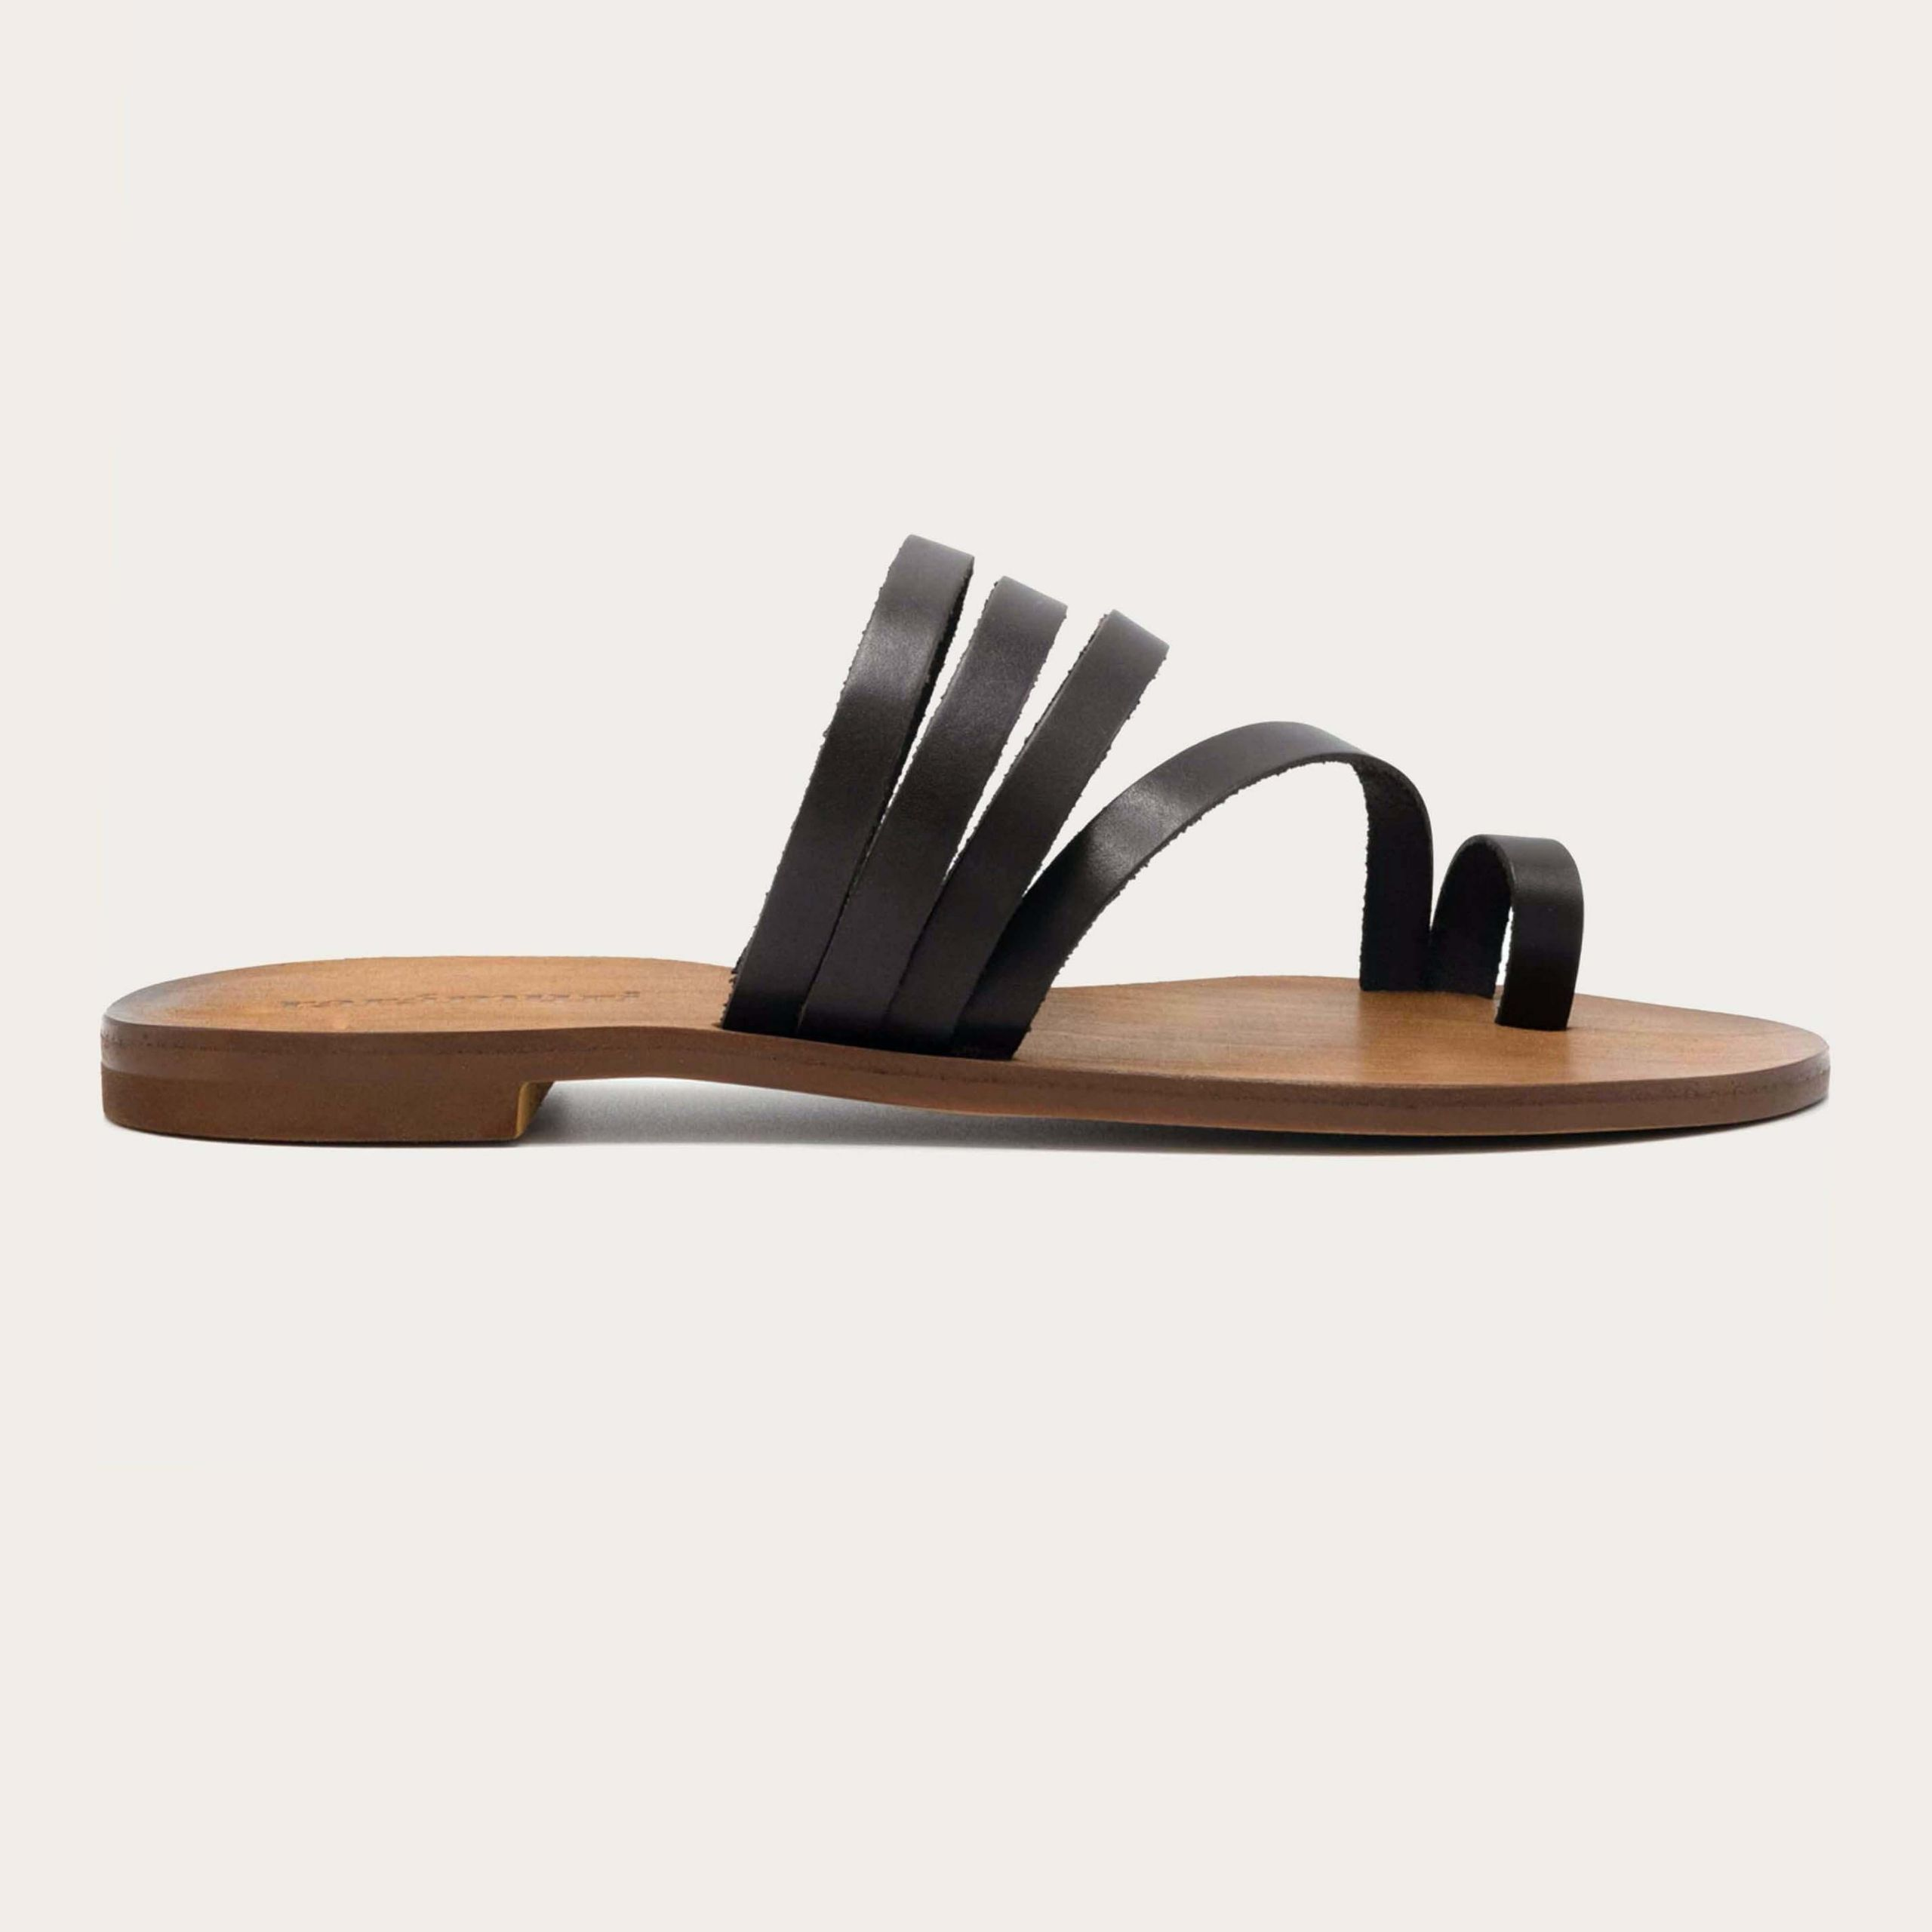 xico-brown_1_lintsandalen sandals travelsandals vegan sustainable sandals wikkelsandalen